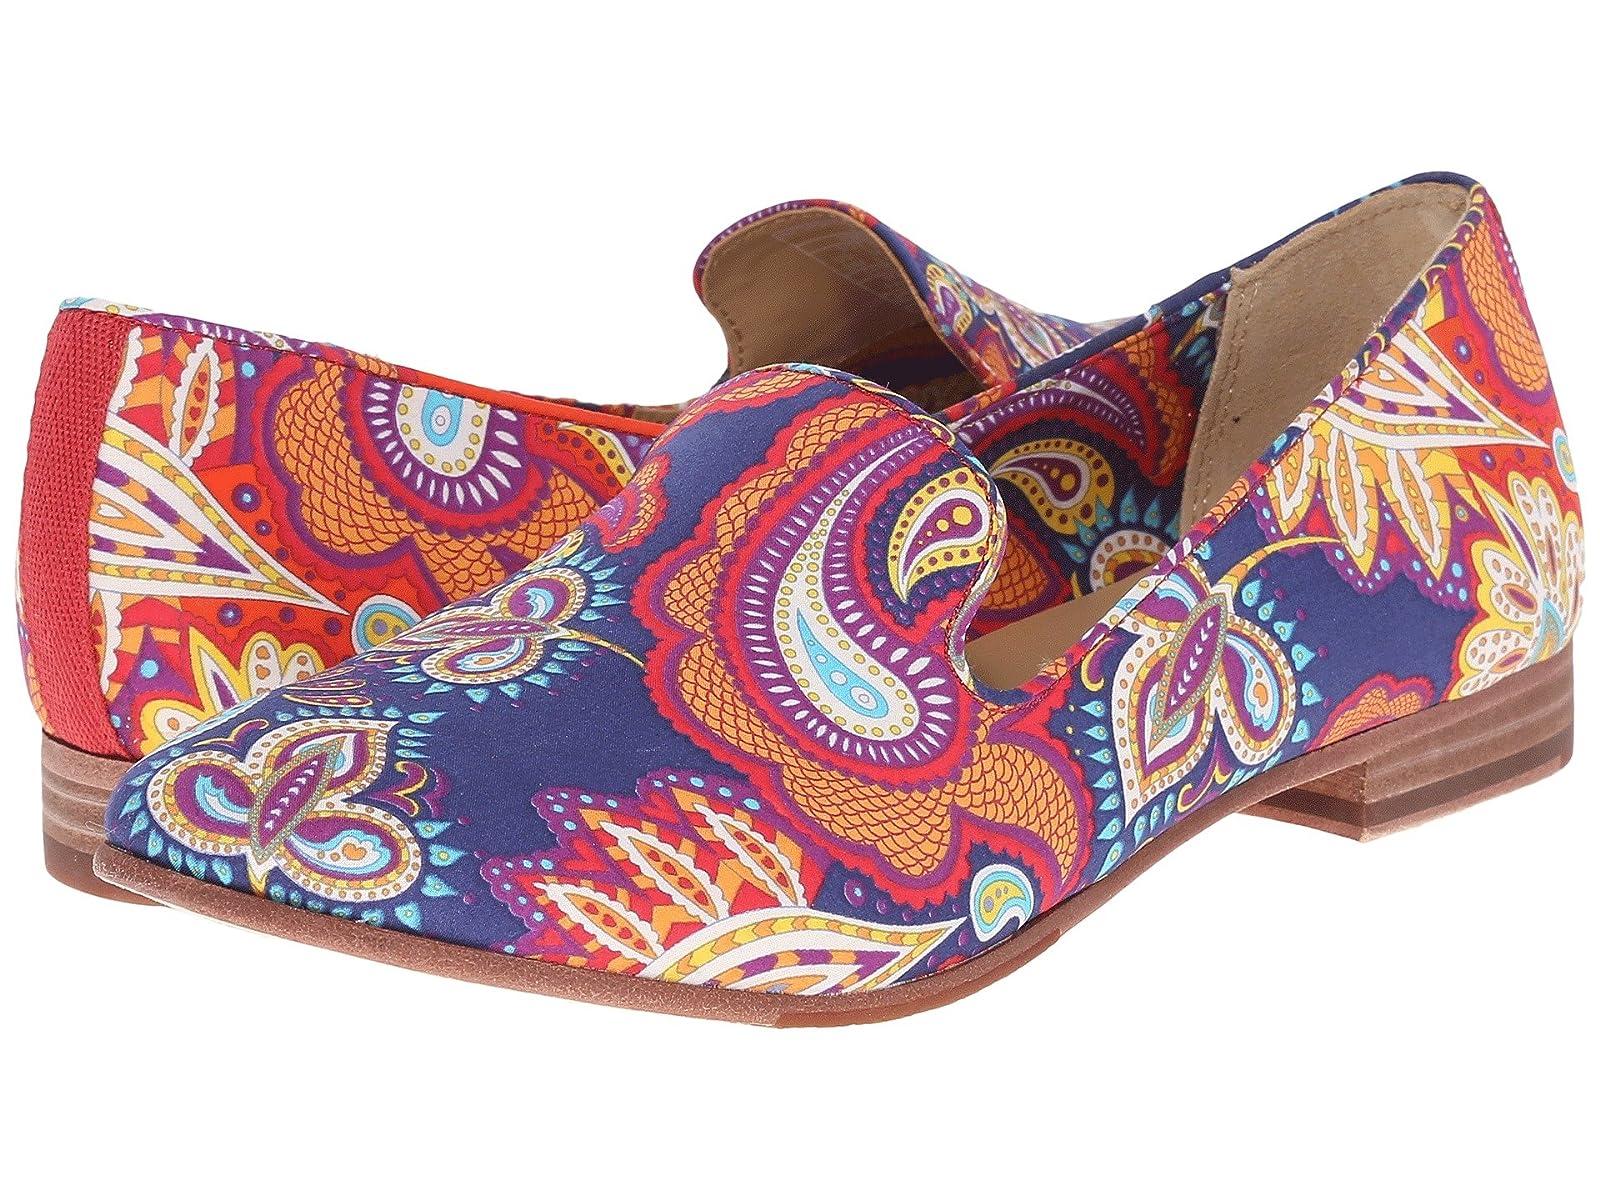 Sebago Hutton Smoking FlatCheap and distinctive eye-catching shoes